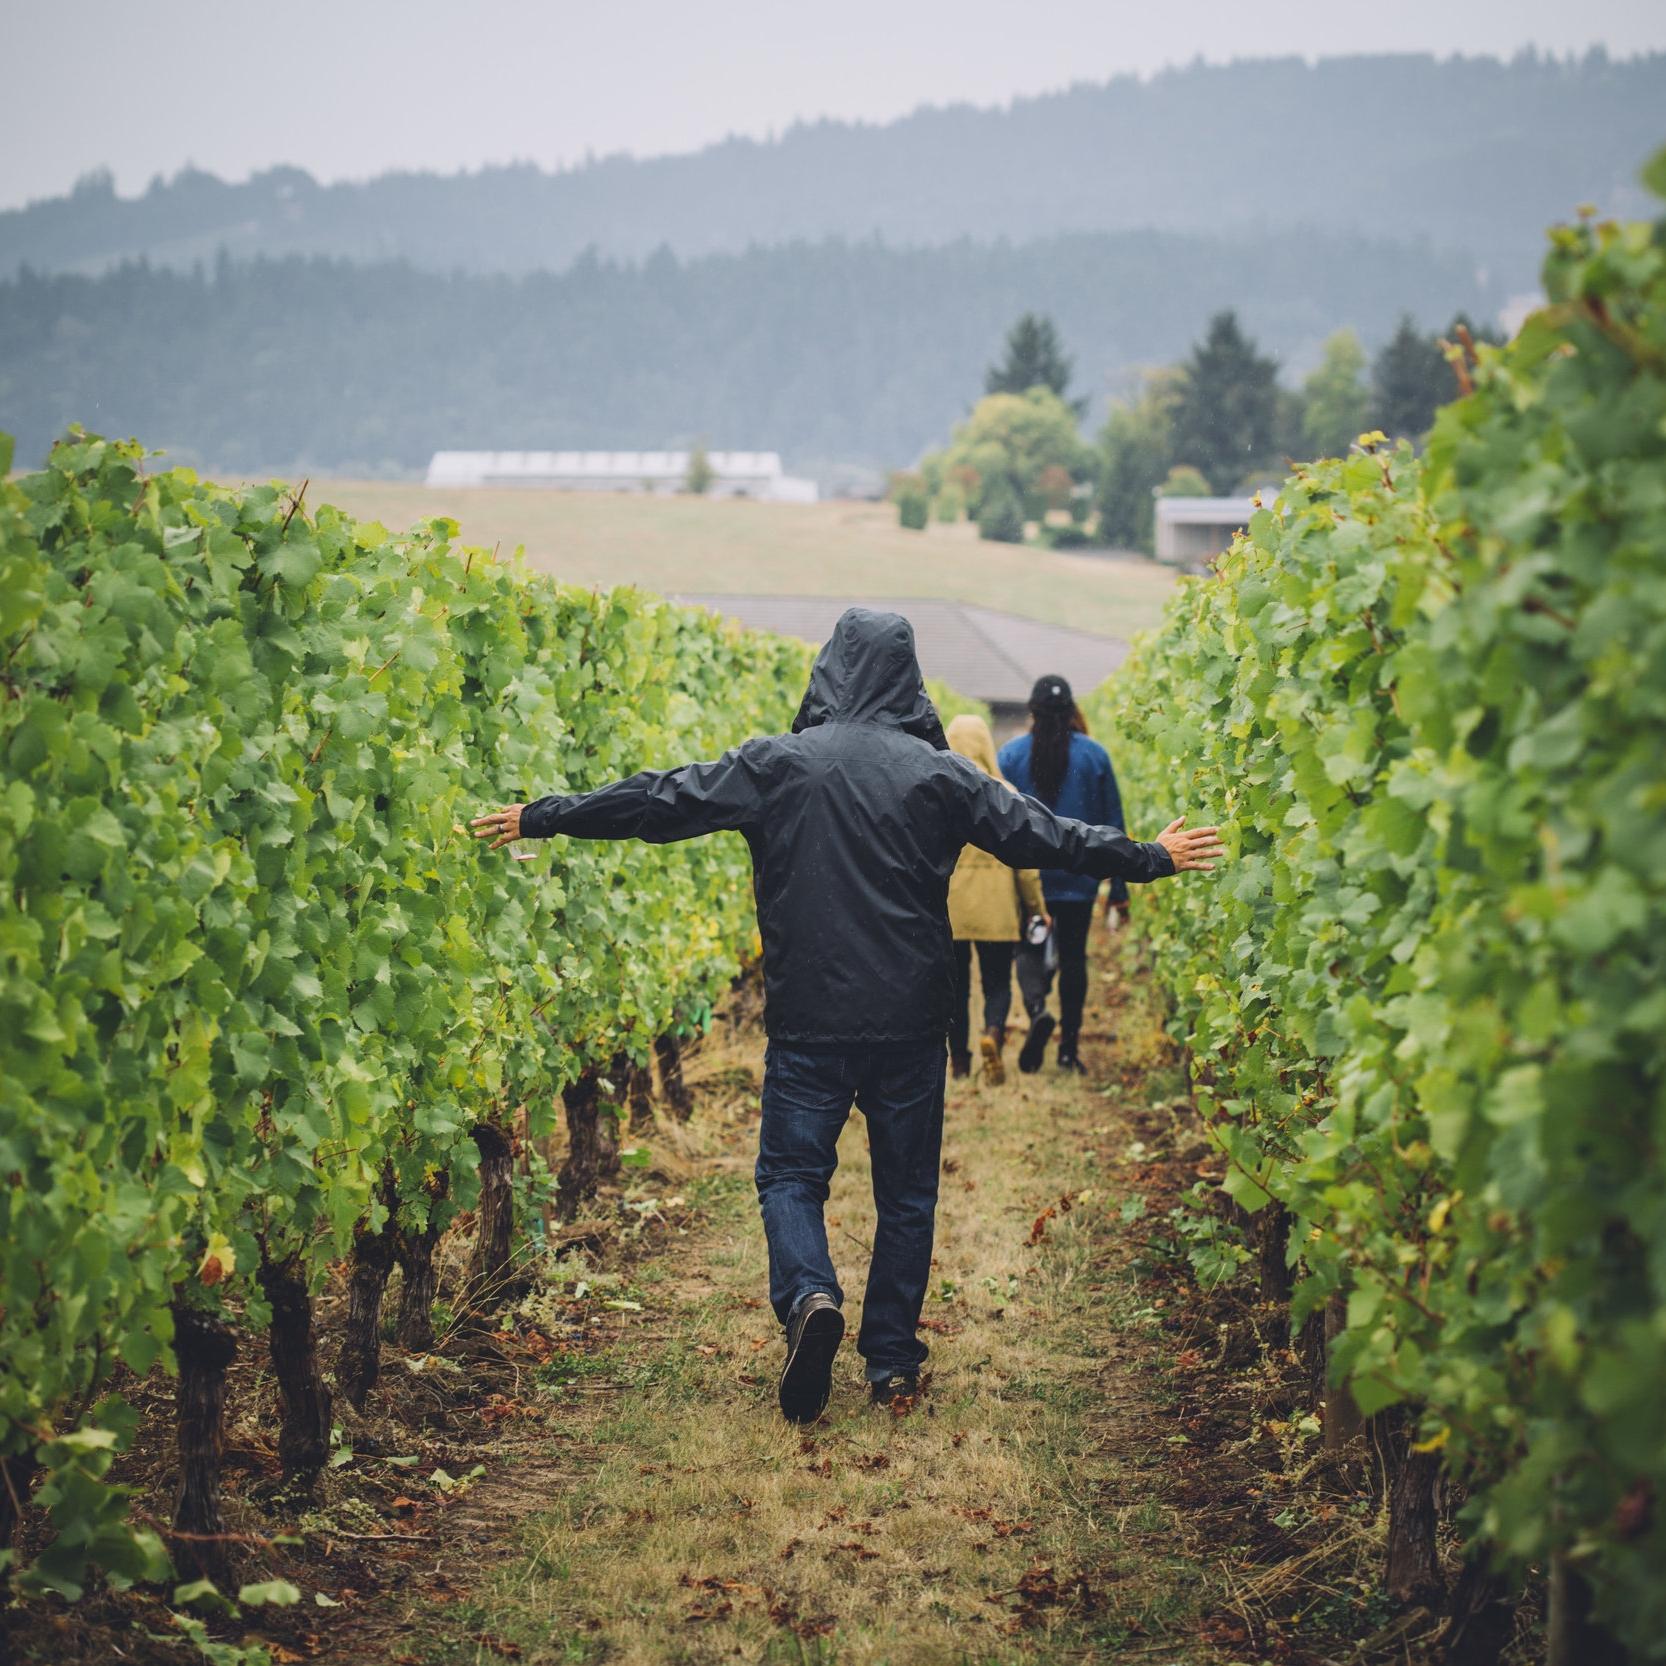 Vineyard Trek, guided treks through the Calkins Lane Vineyard